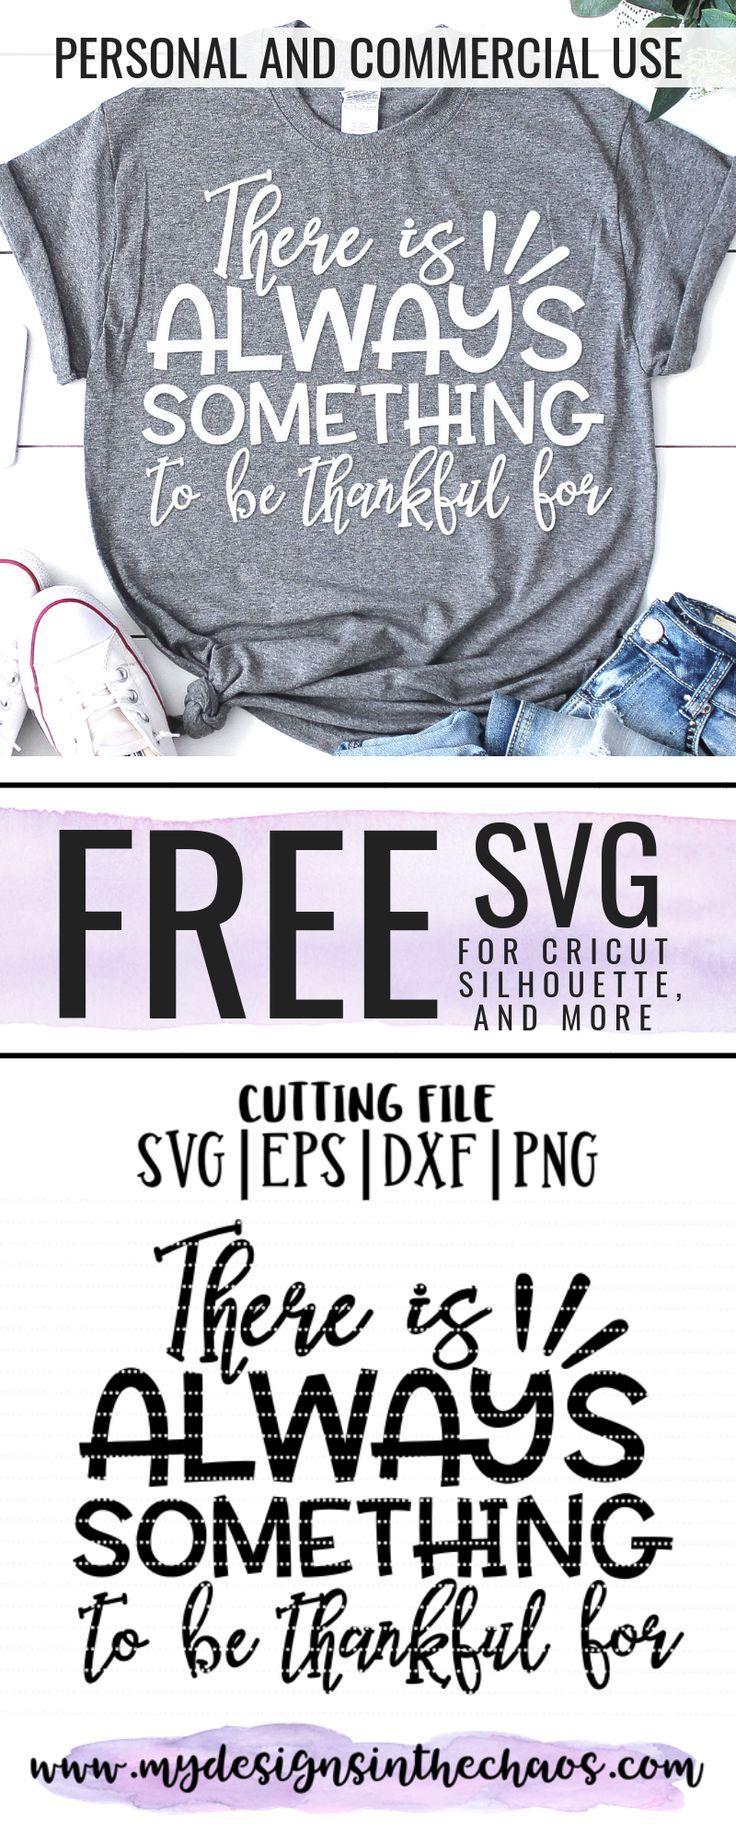 Free Thanksgiving SVG Files Cricut, Svg files for cricut